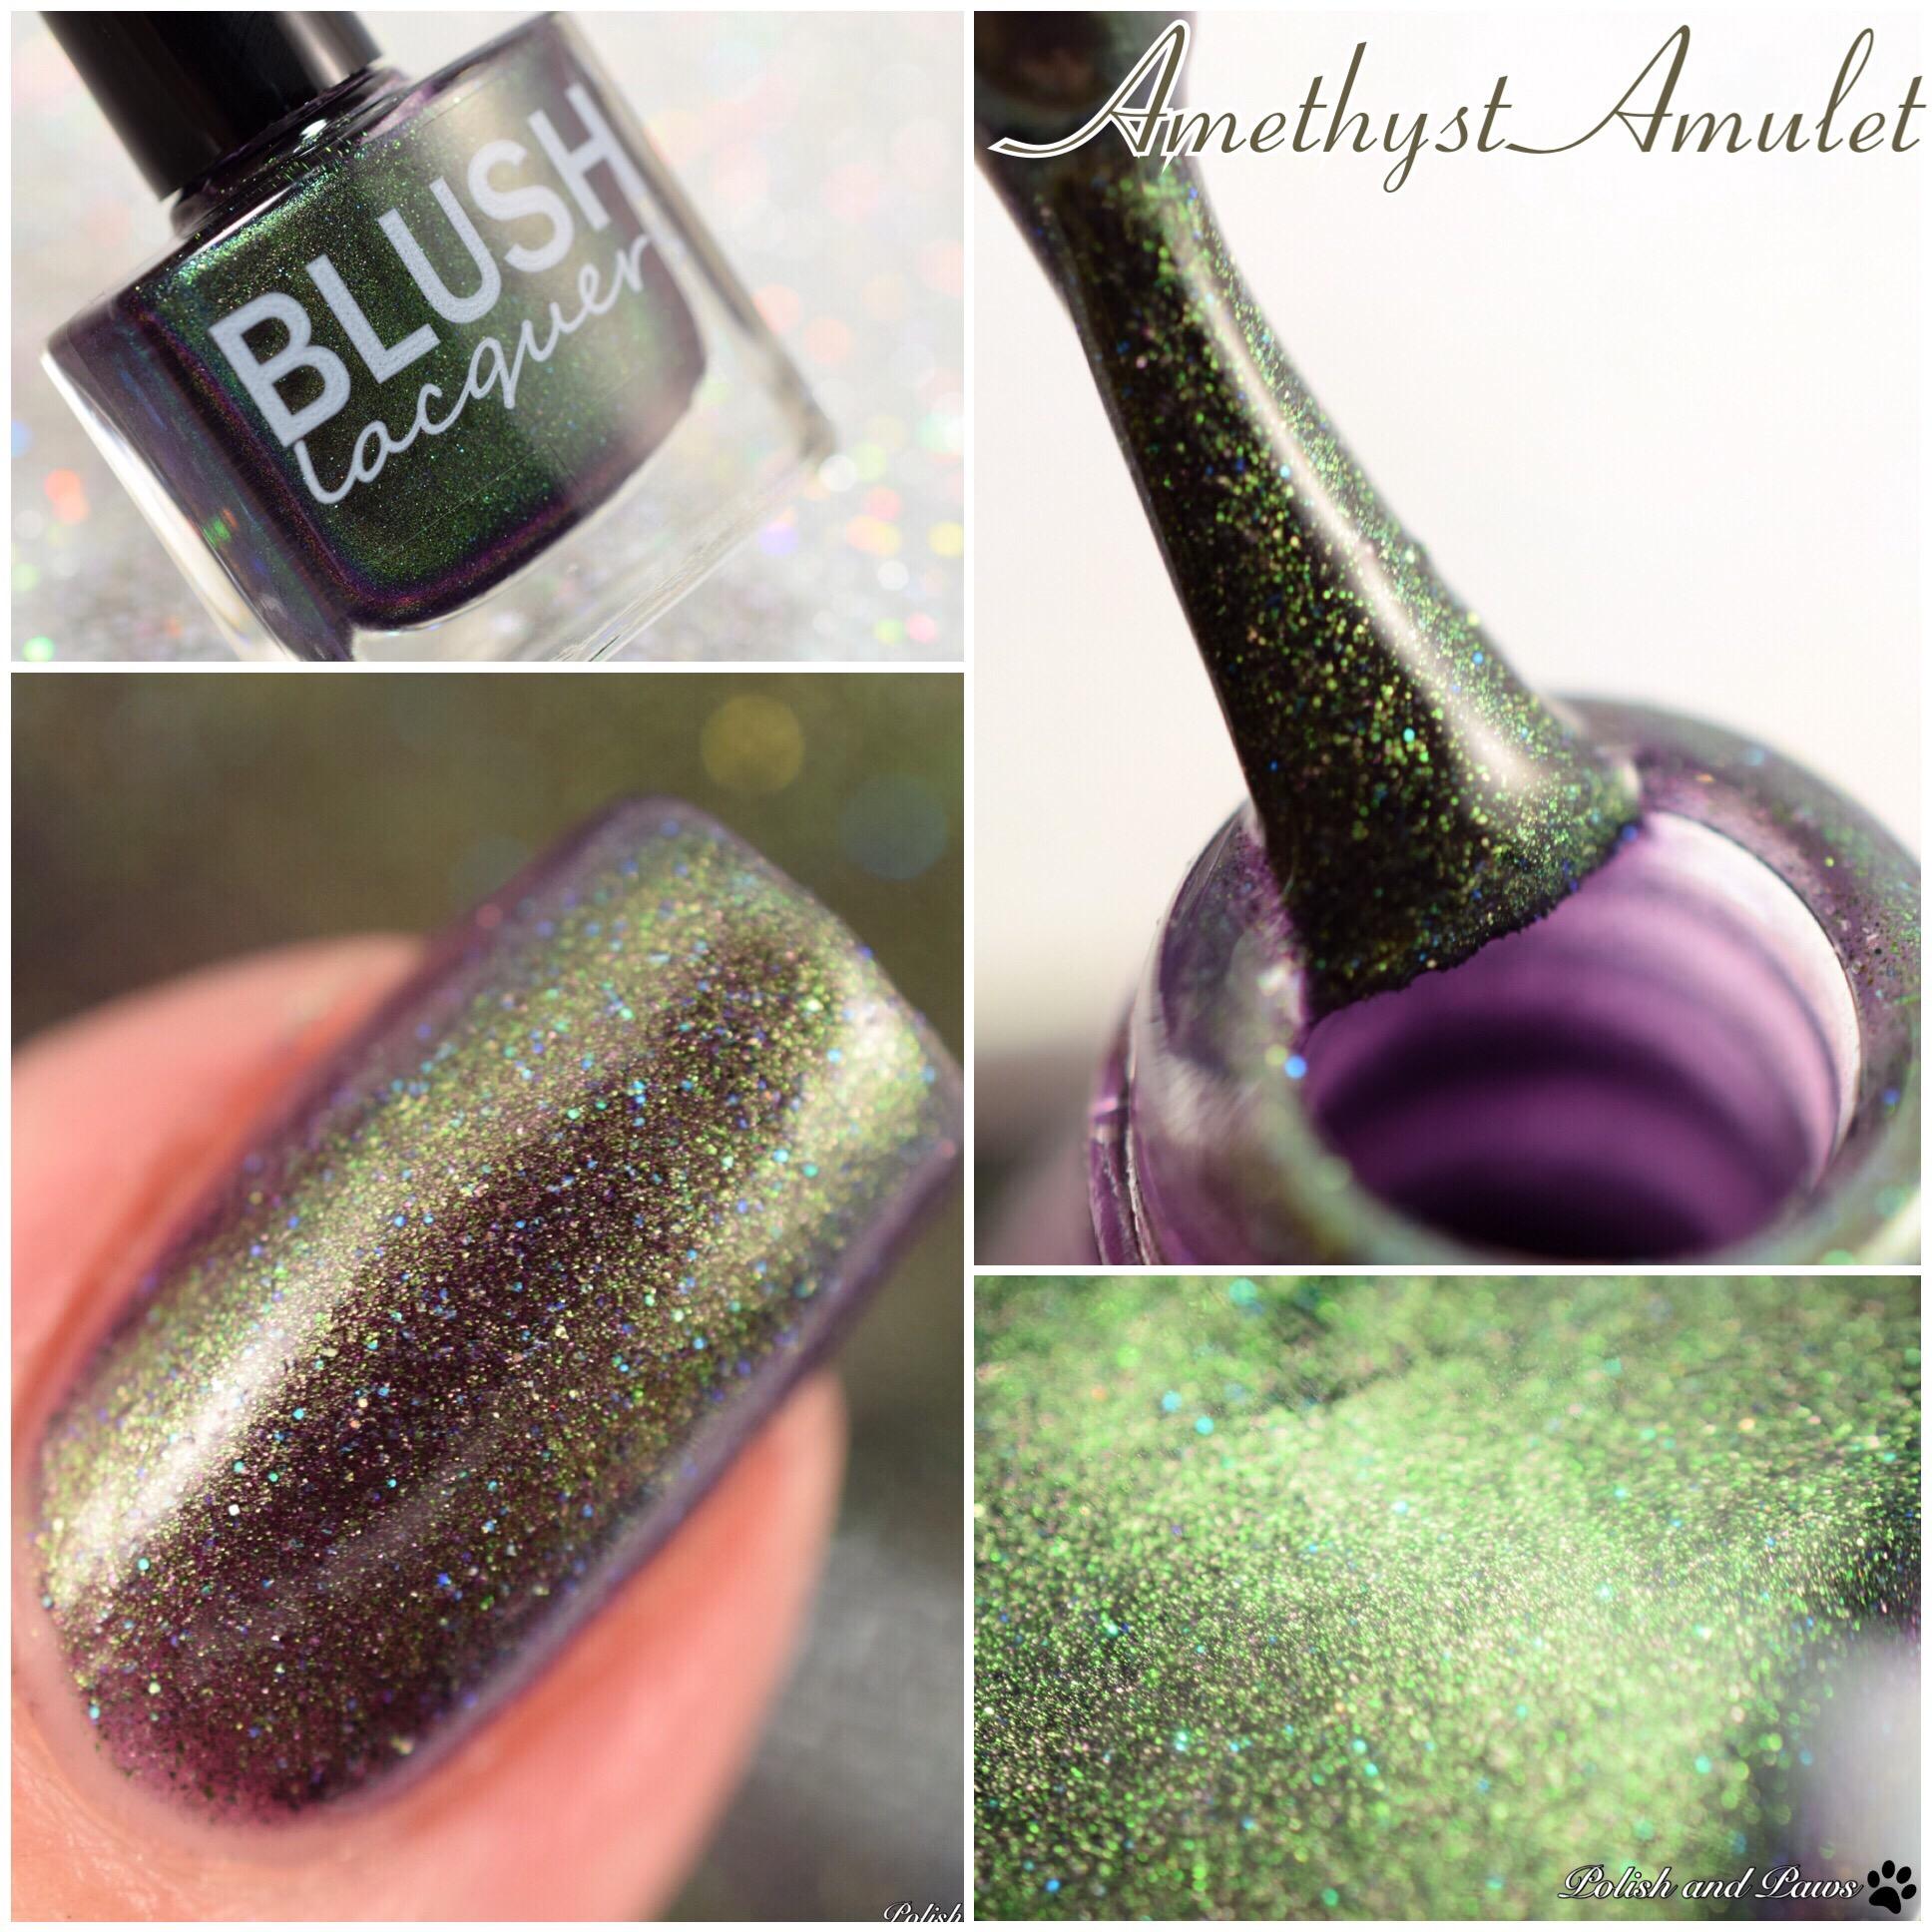 Blush Lacquers Amethyst Amulet